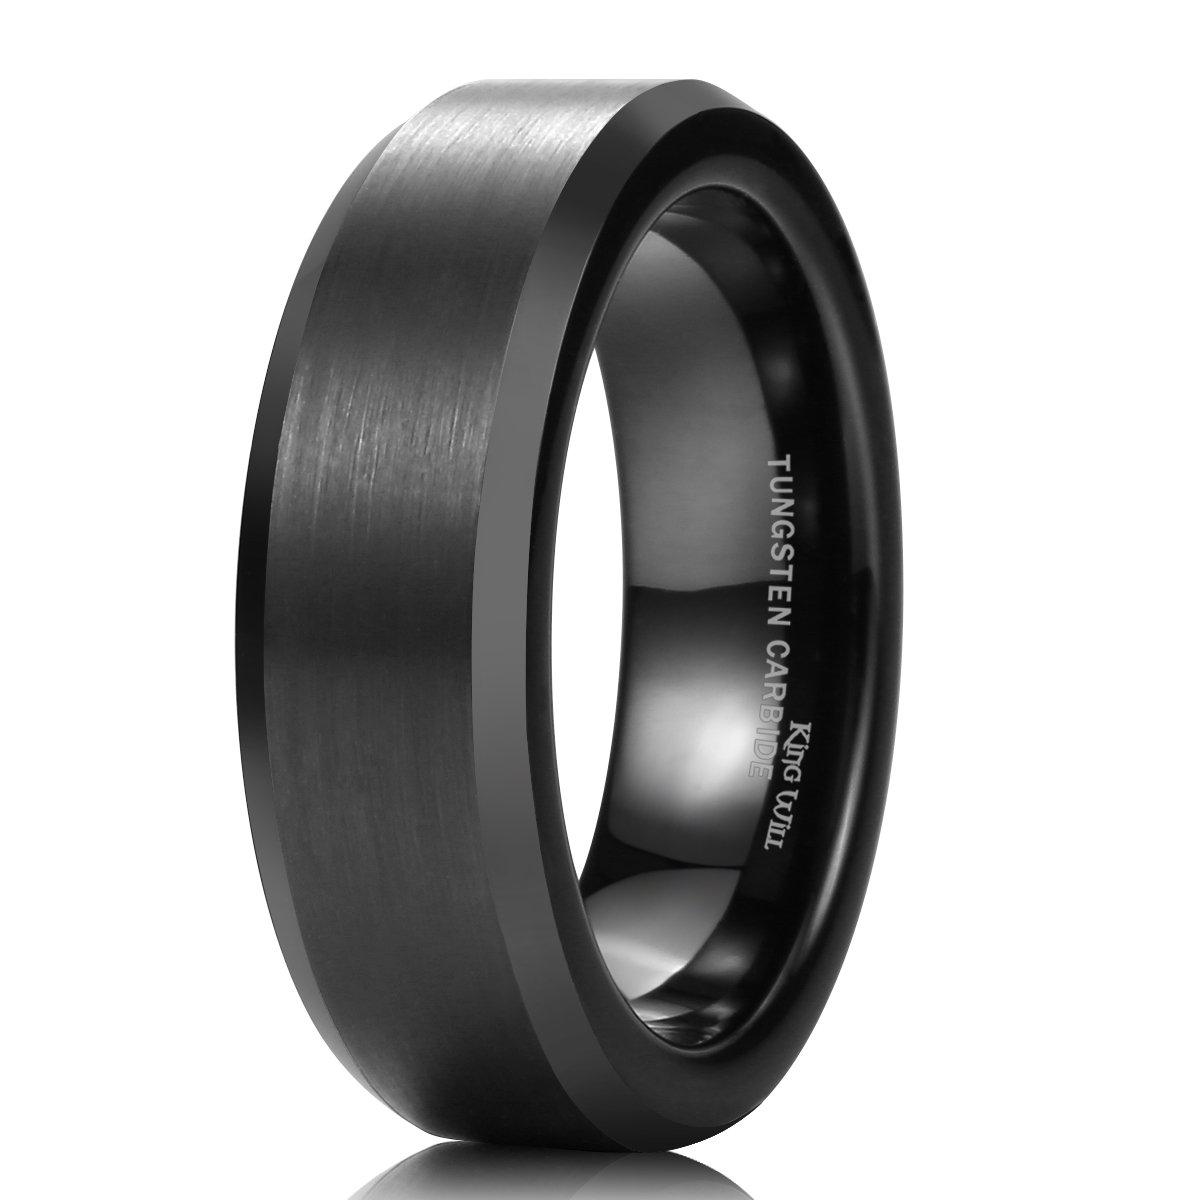 King Will BASIC 6mm Black Tungsten Wedding Band Ring Matte Finish Center Beveled Polished Edge 10